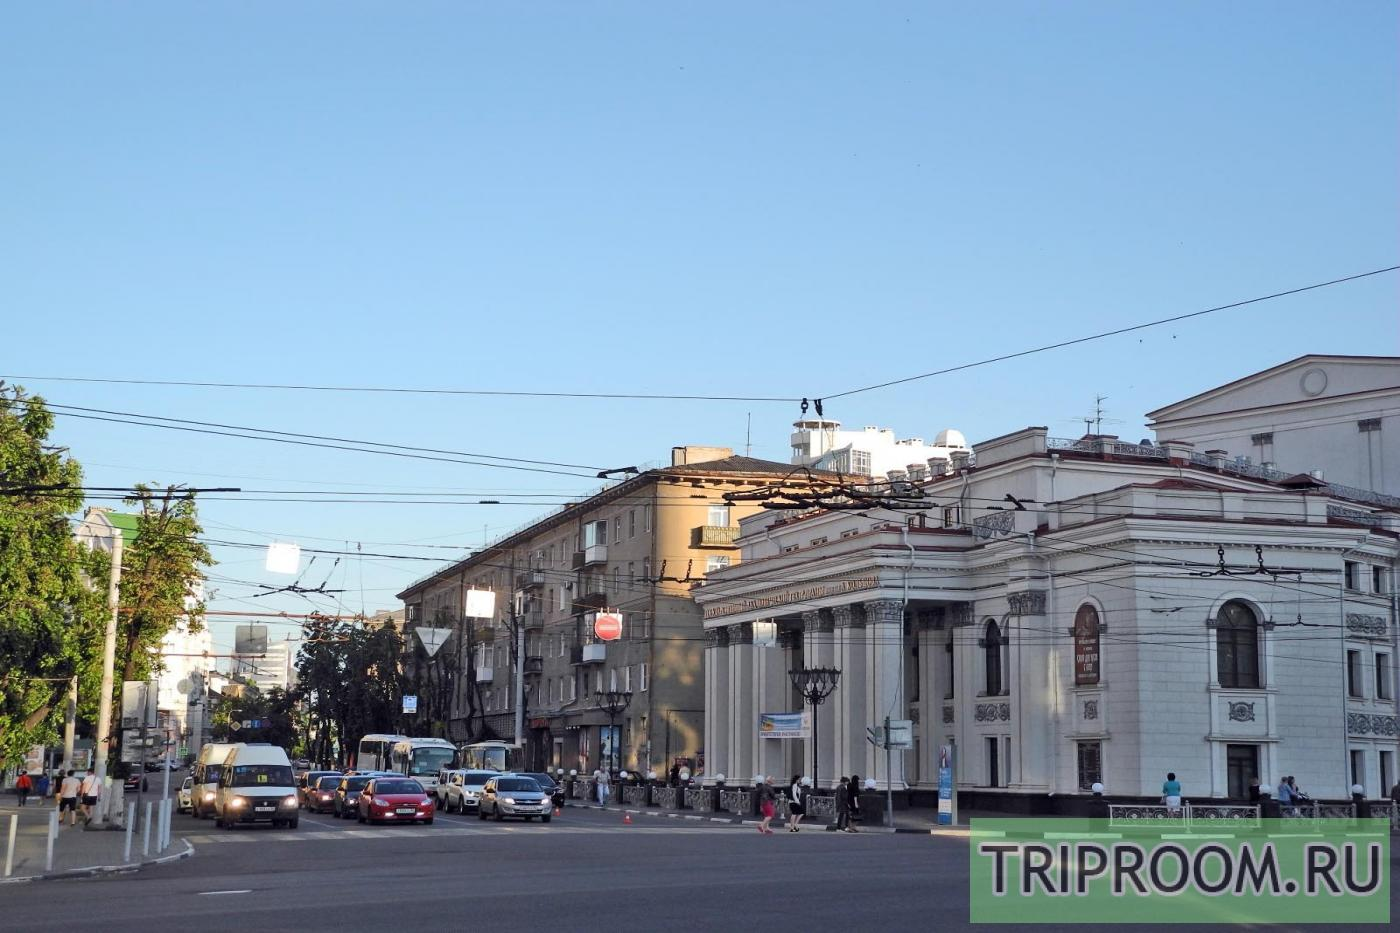 1-комнатная квартира посуточно (вариант № 3871), ул. Кардашова улица, фото № 18